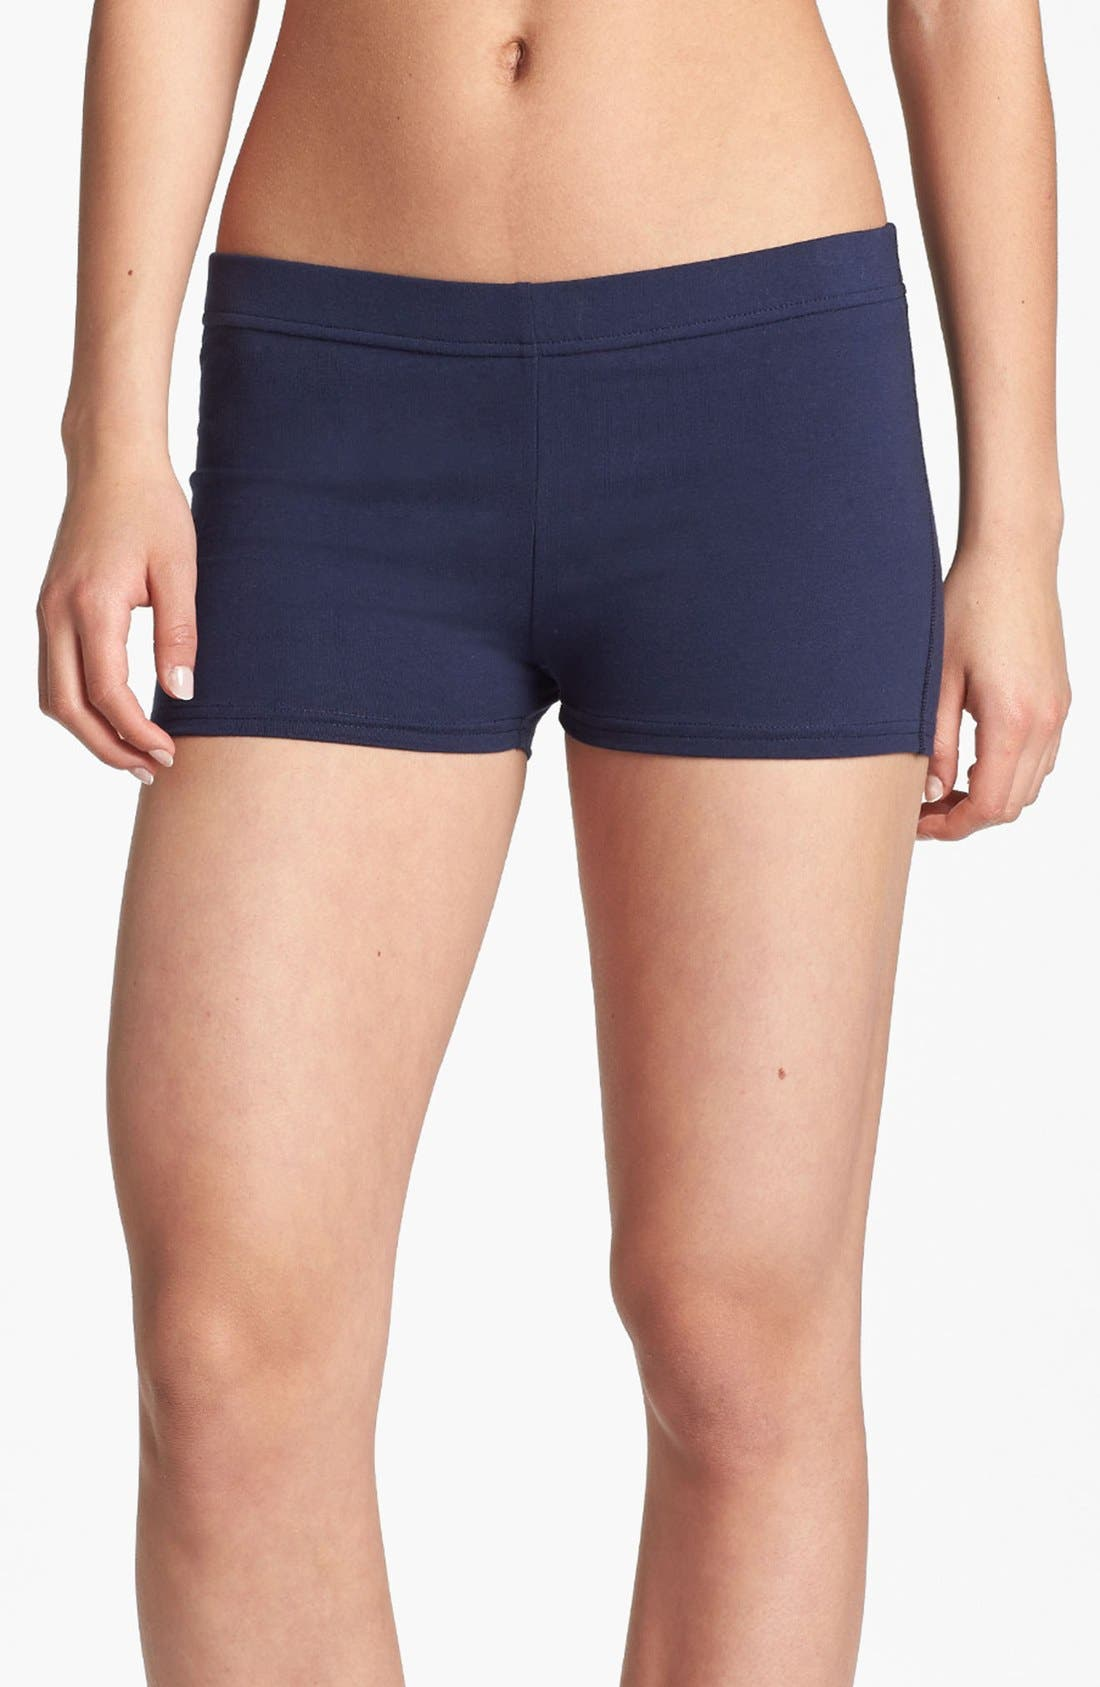 Alternate Image 1 Selected - BP. Undercover Lounge Shorts (Juniors)